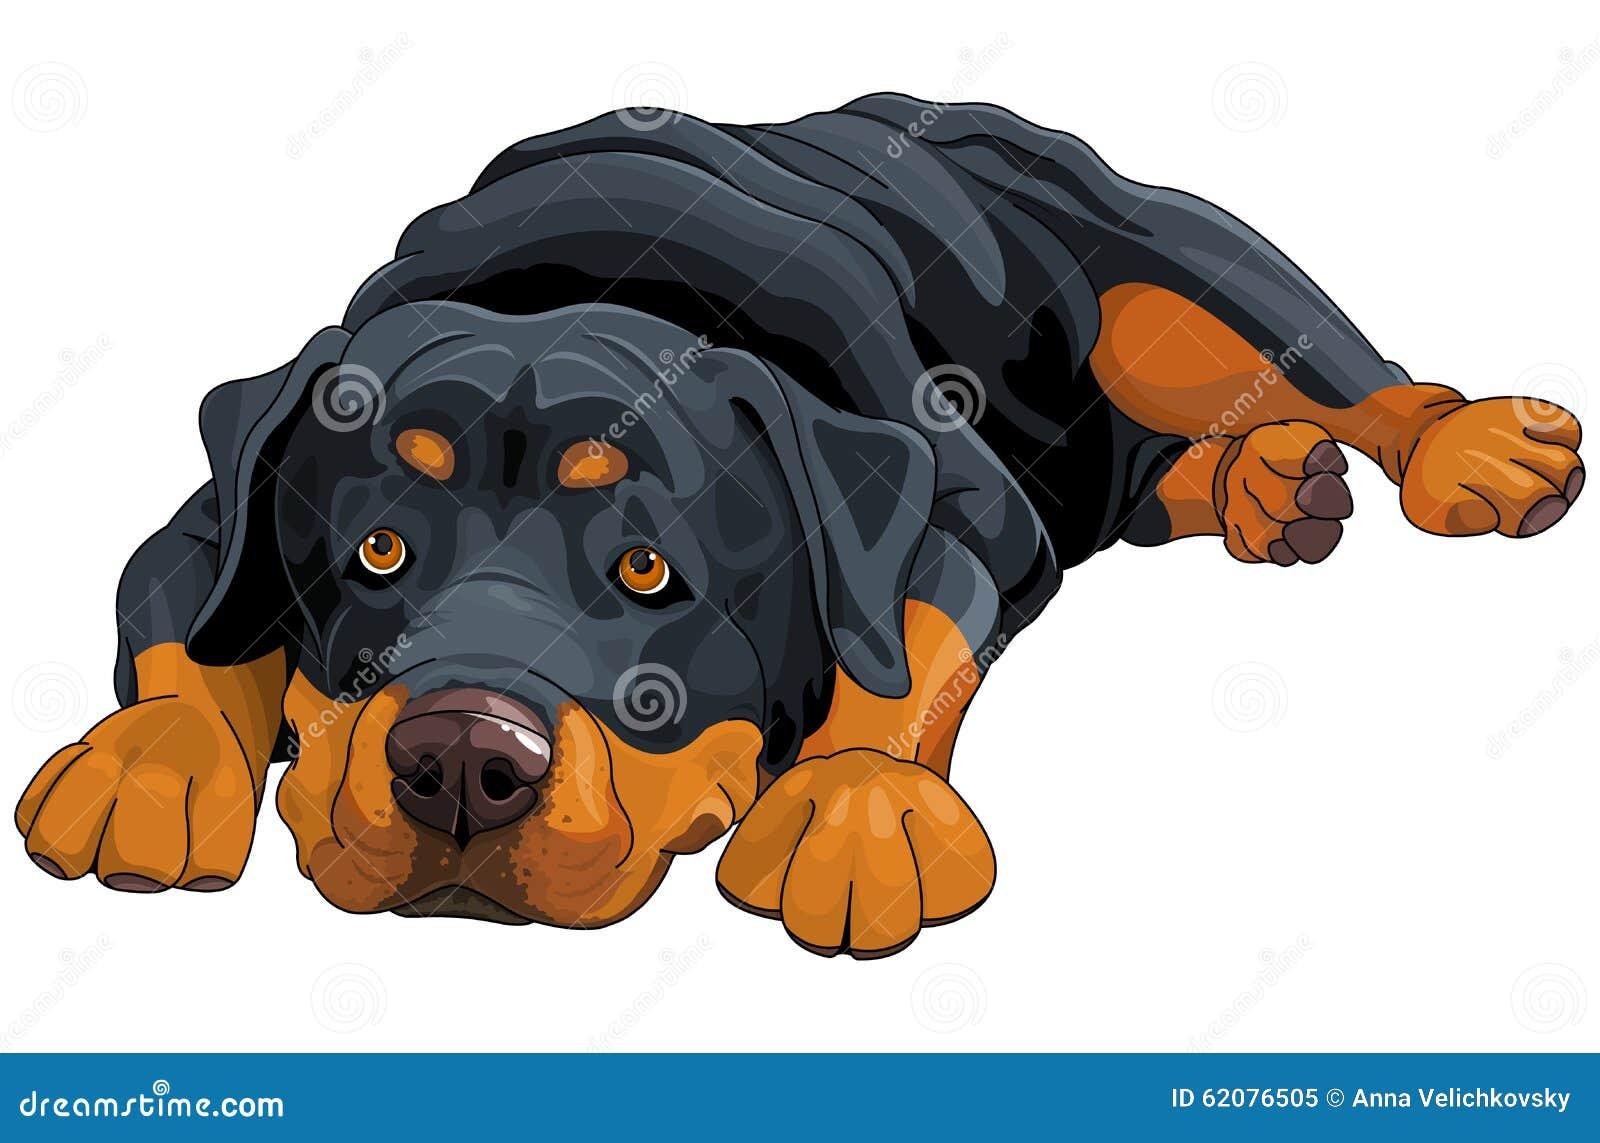 rottweiler cartoons illustrations amp vector stock images